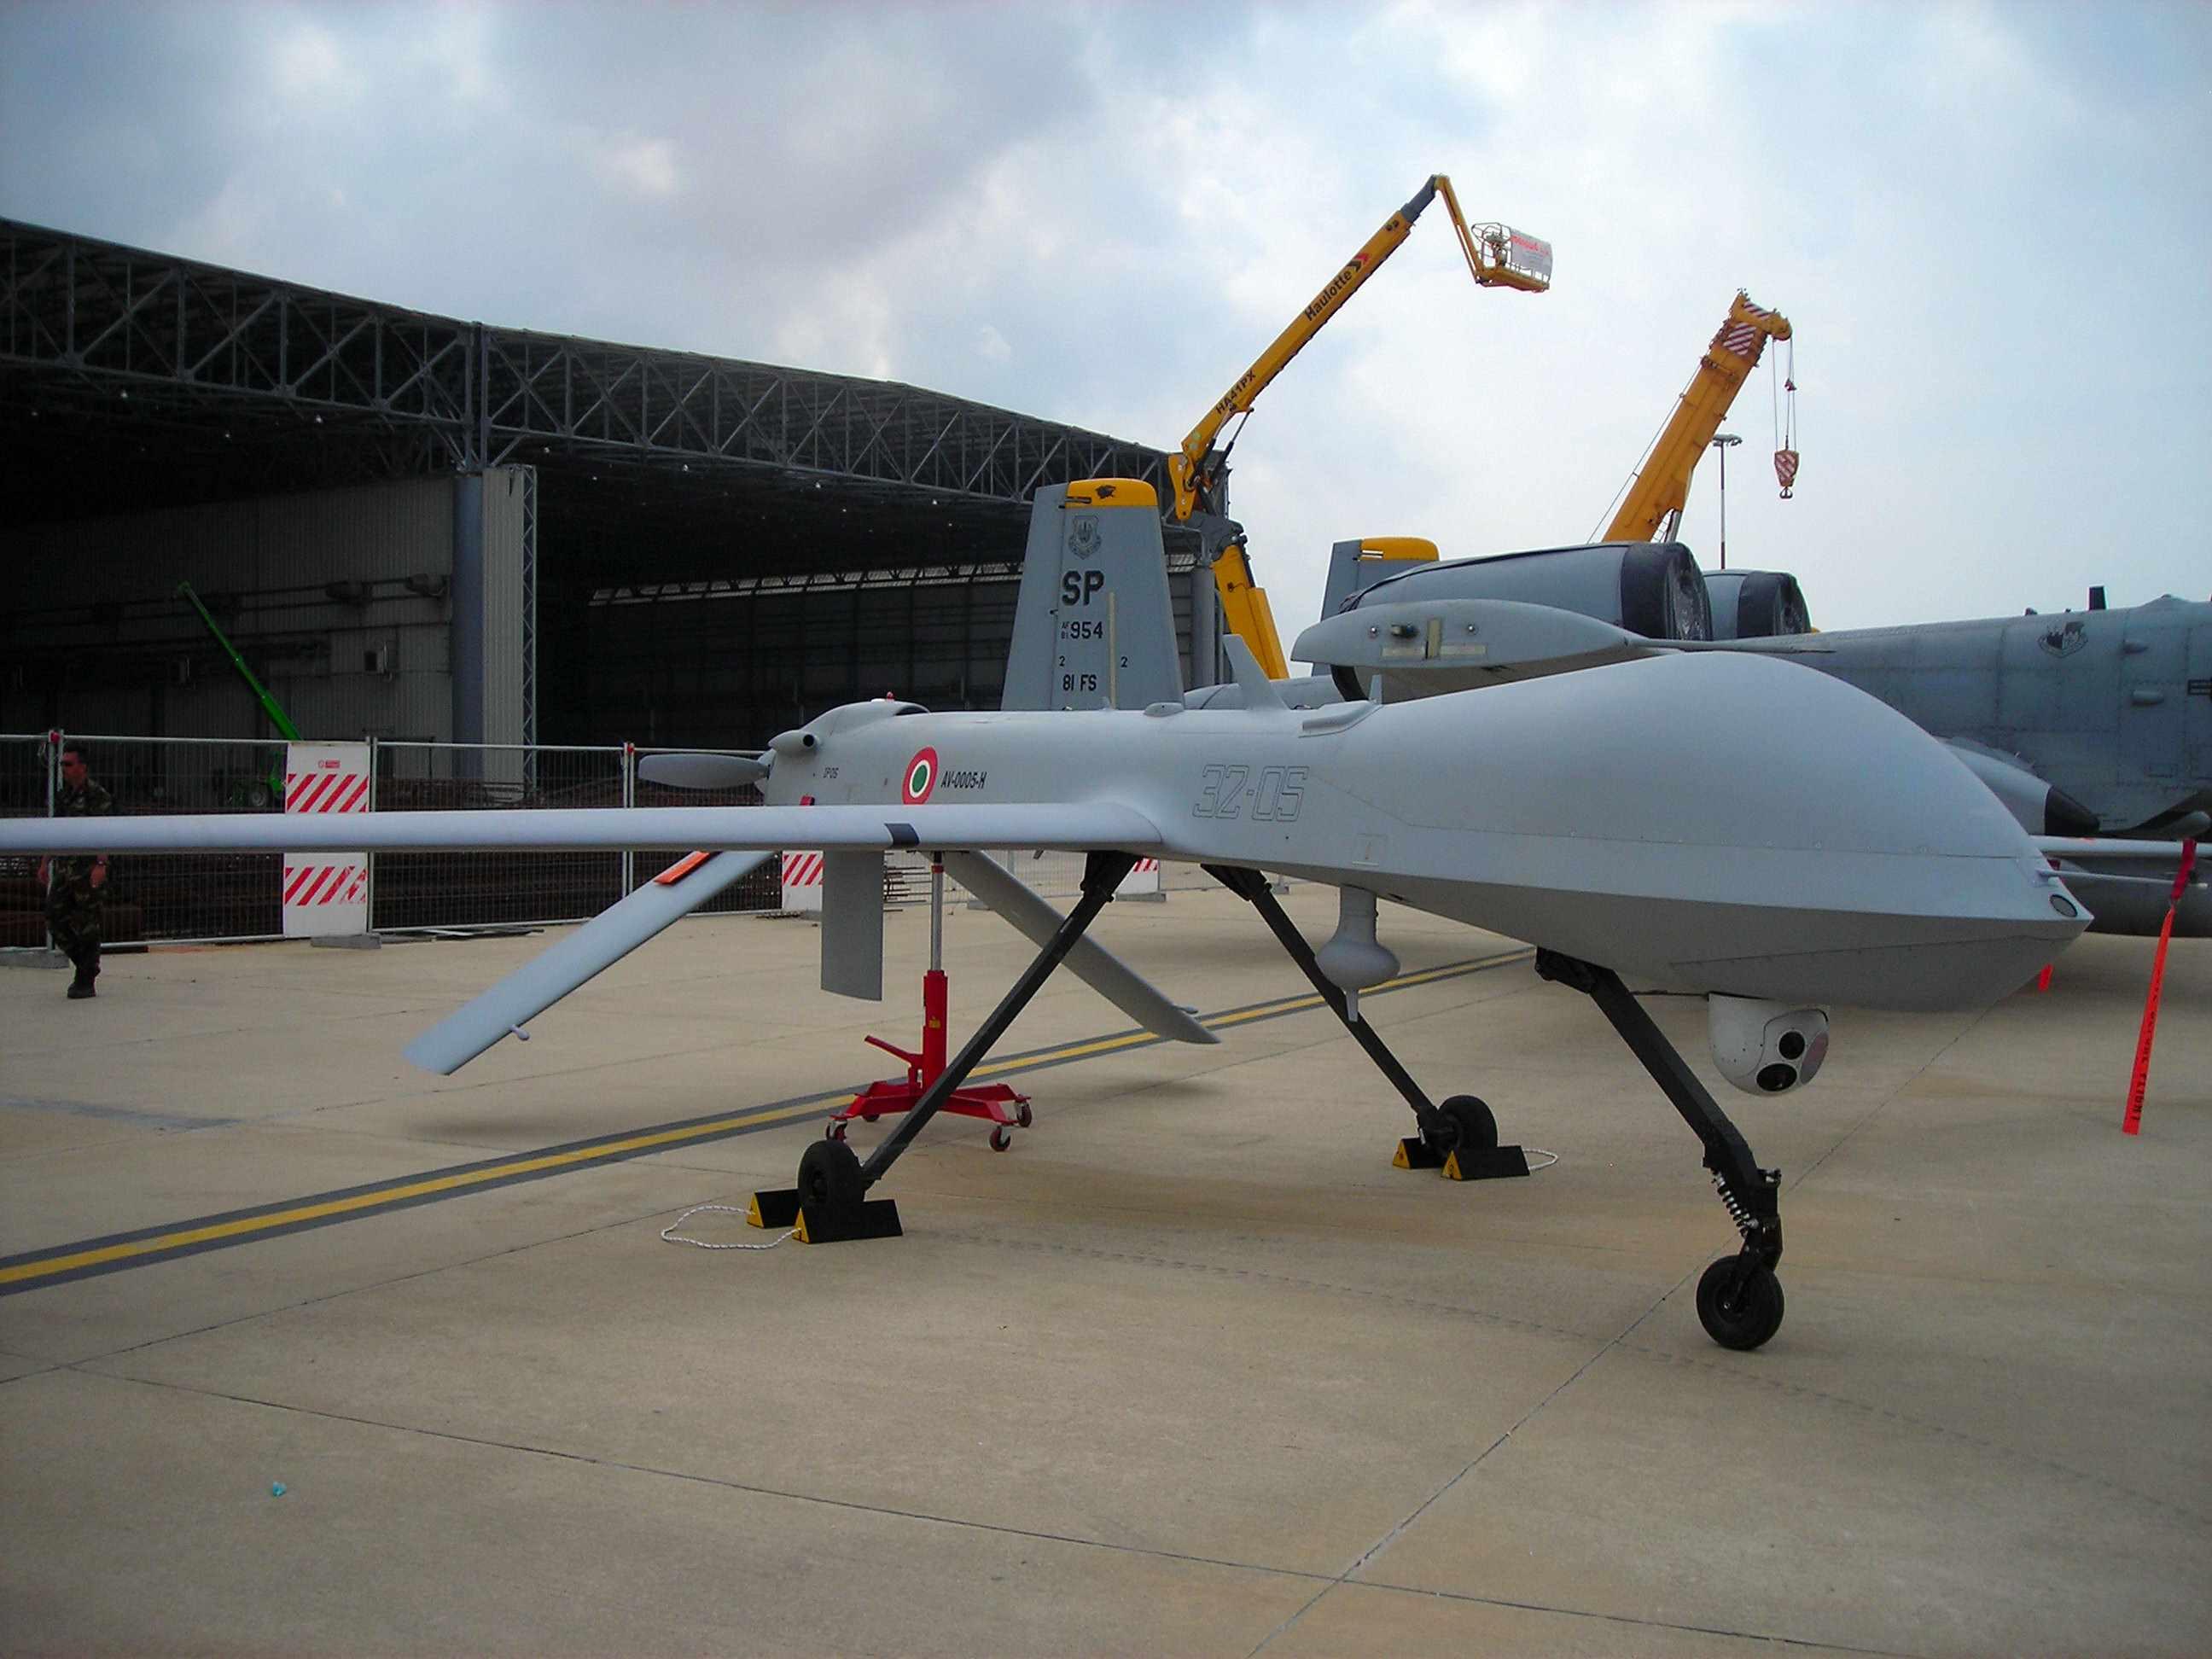 БЛА MQ-1 Predator ВВС Италии.